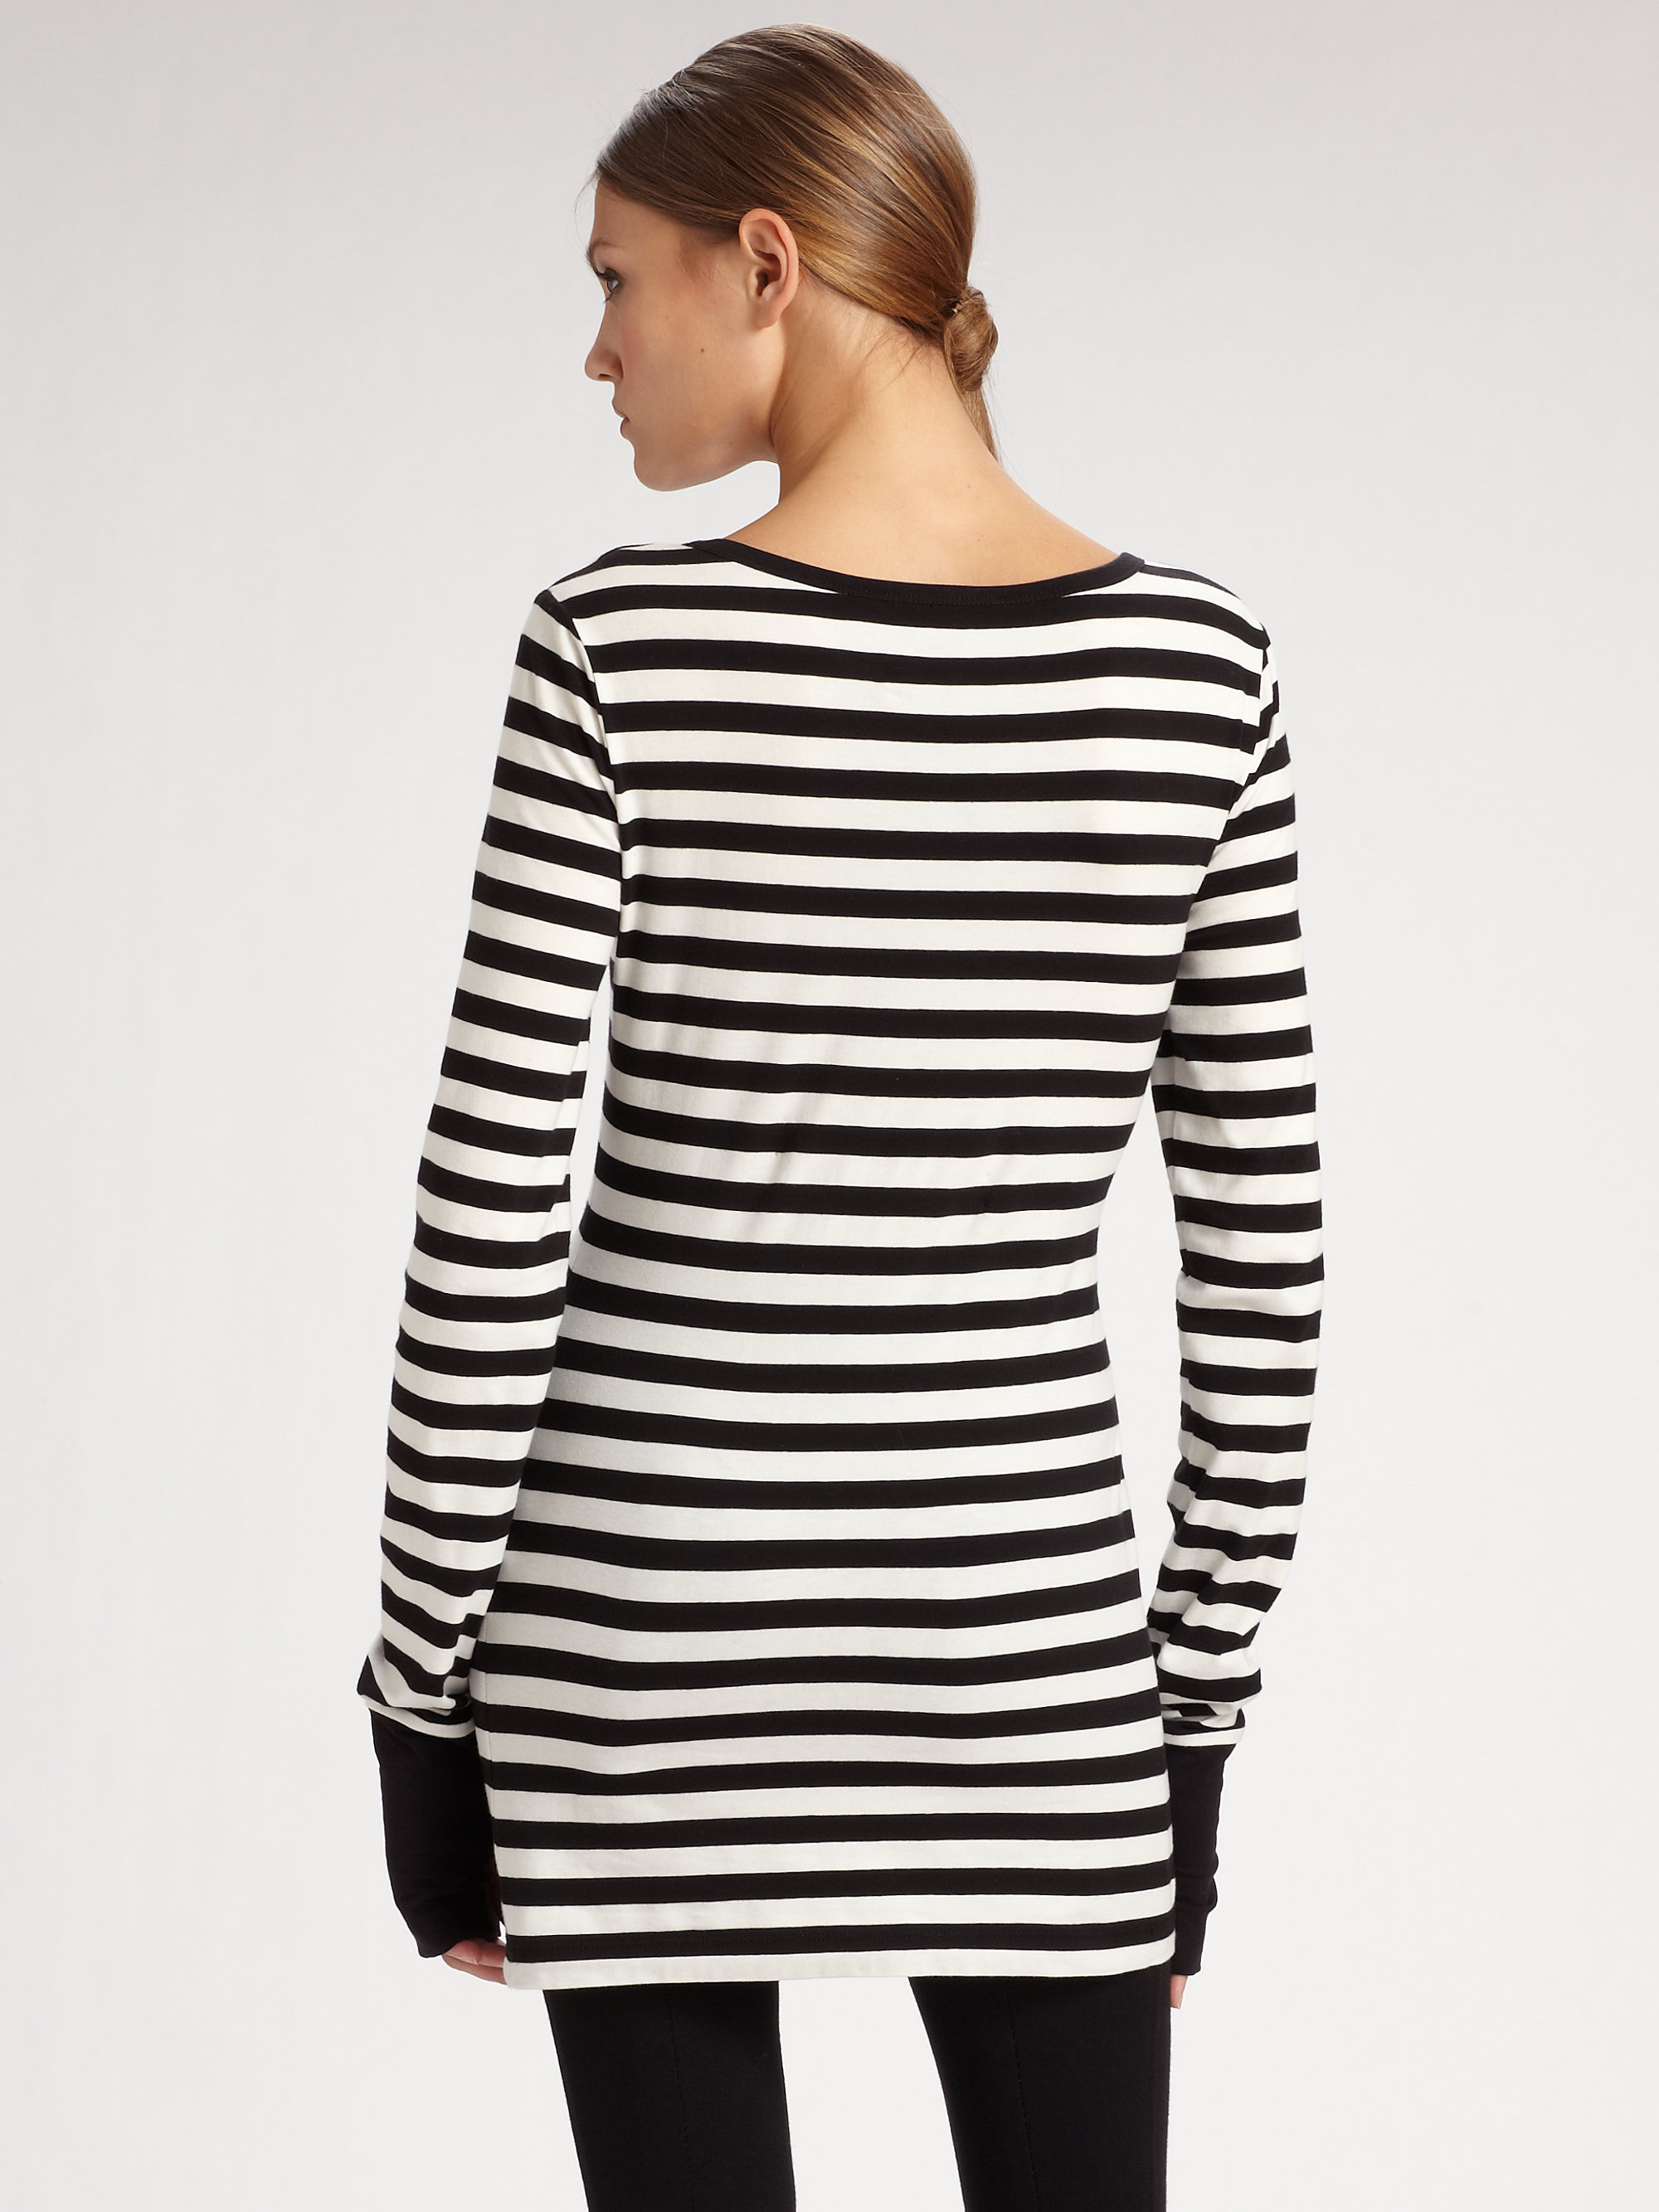 Lyst Dkny Striped Tunic Top In Black